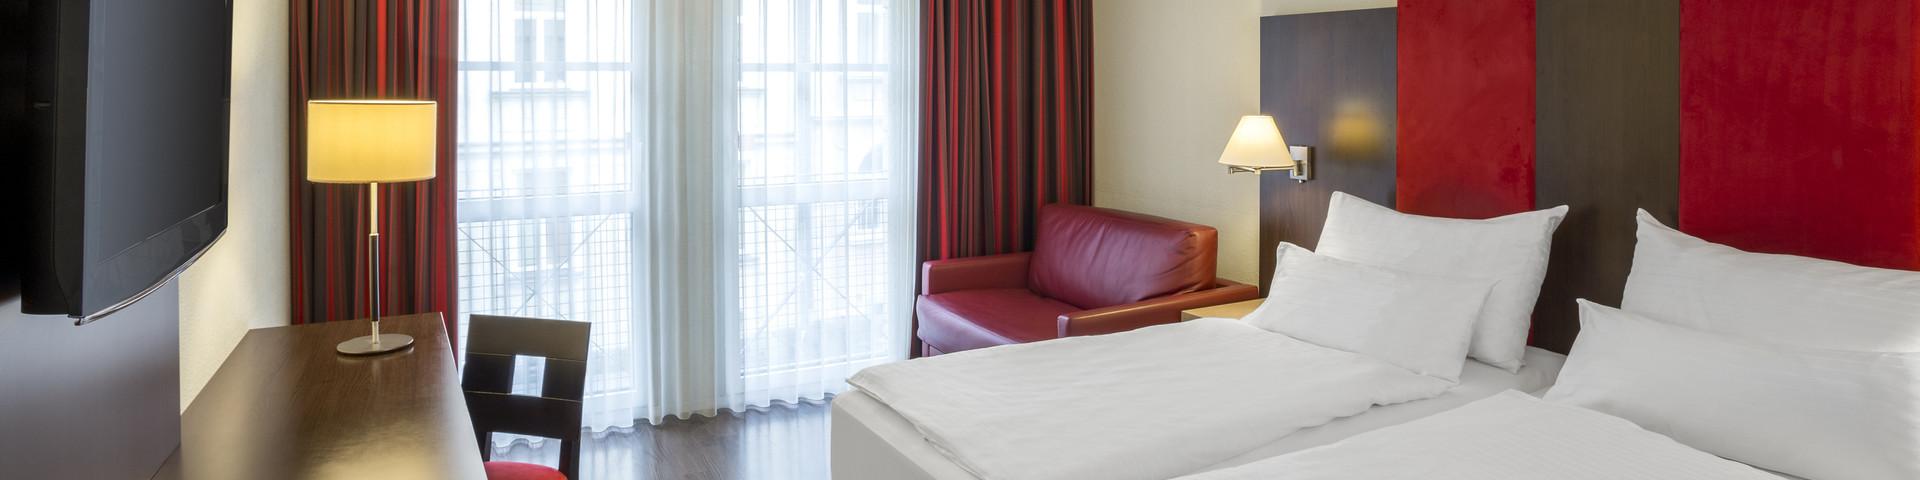 Hotel NH Salzburg City - Standardzimmer © NH Salzburg City